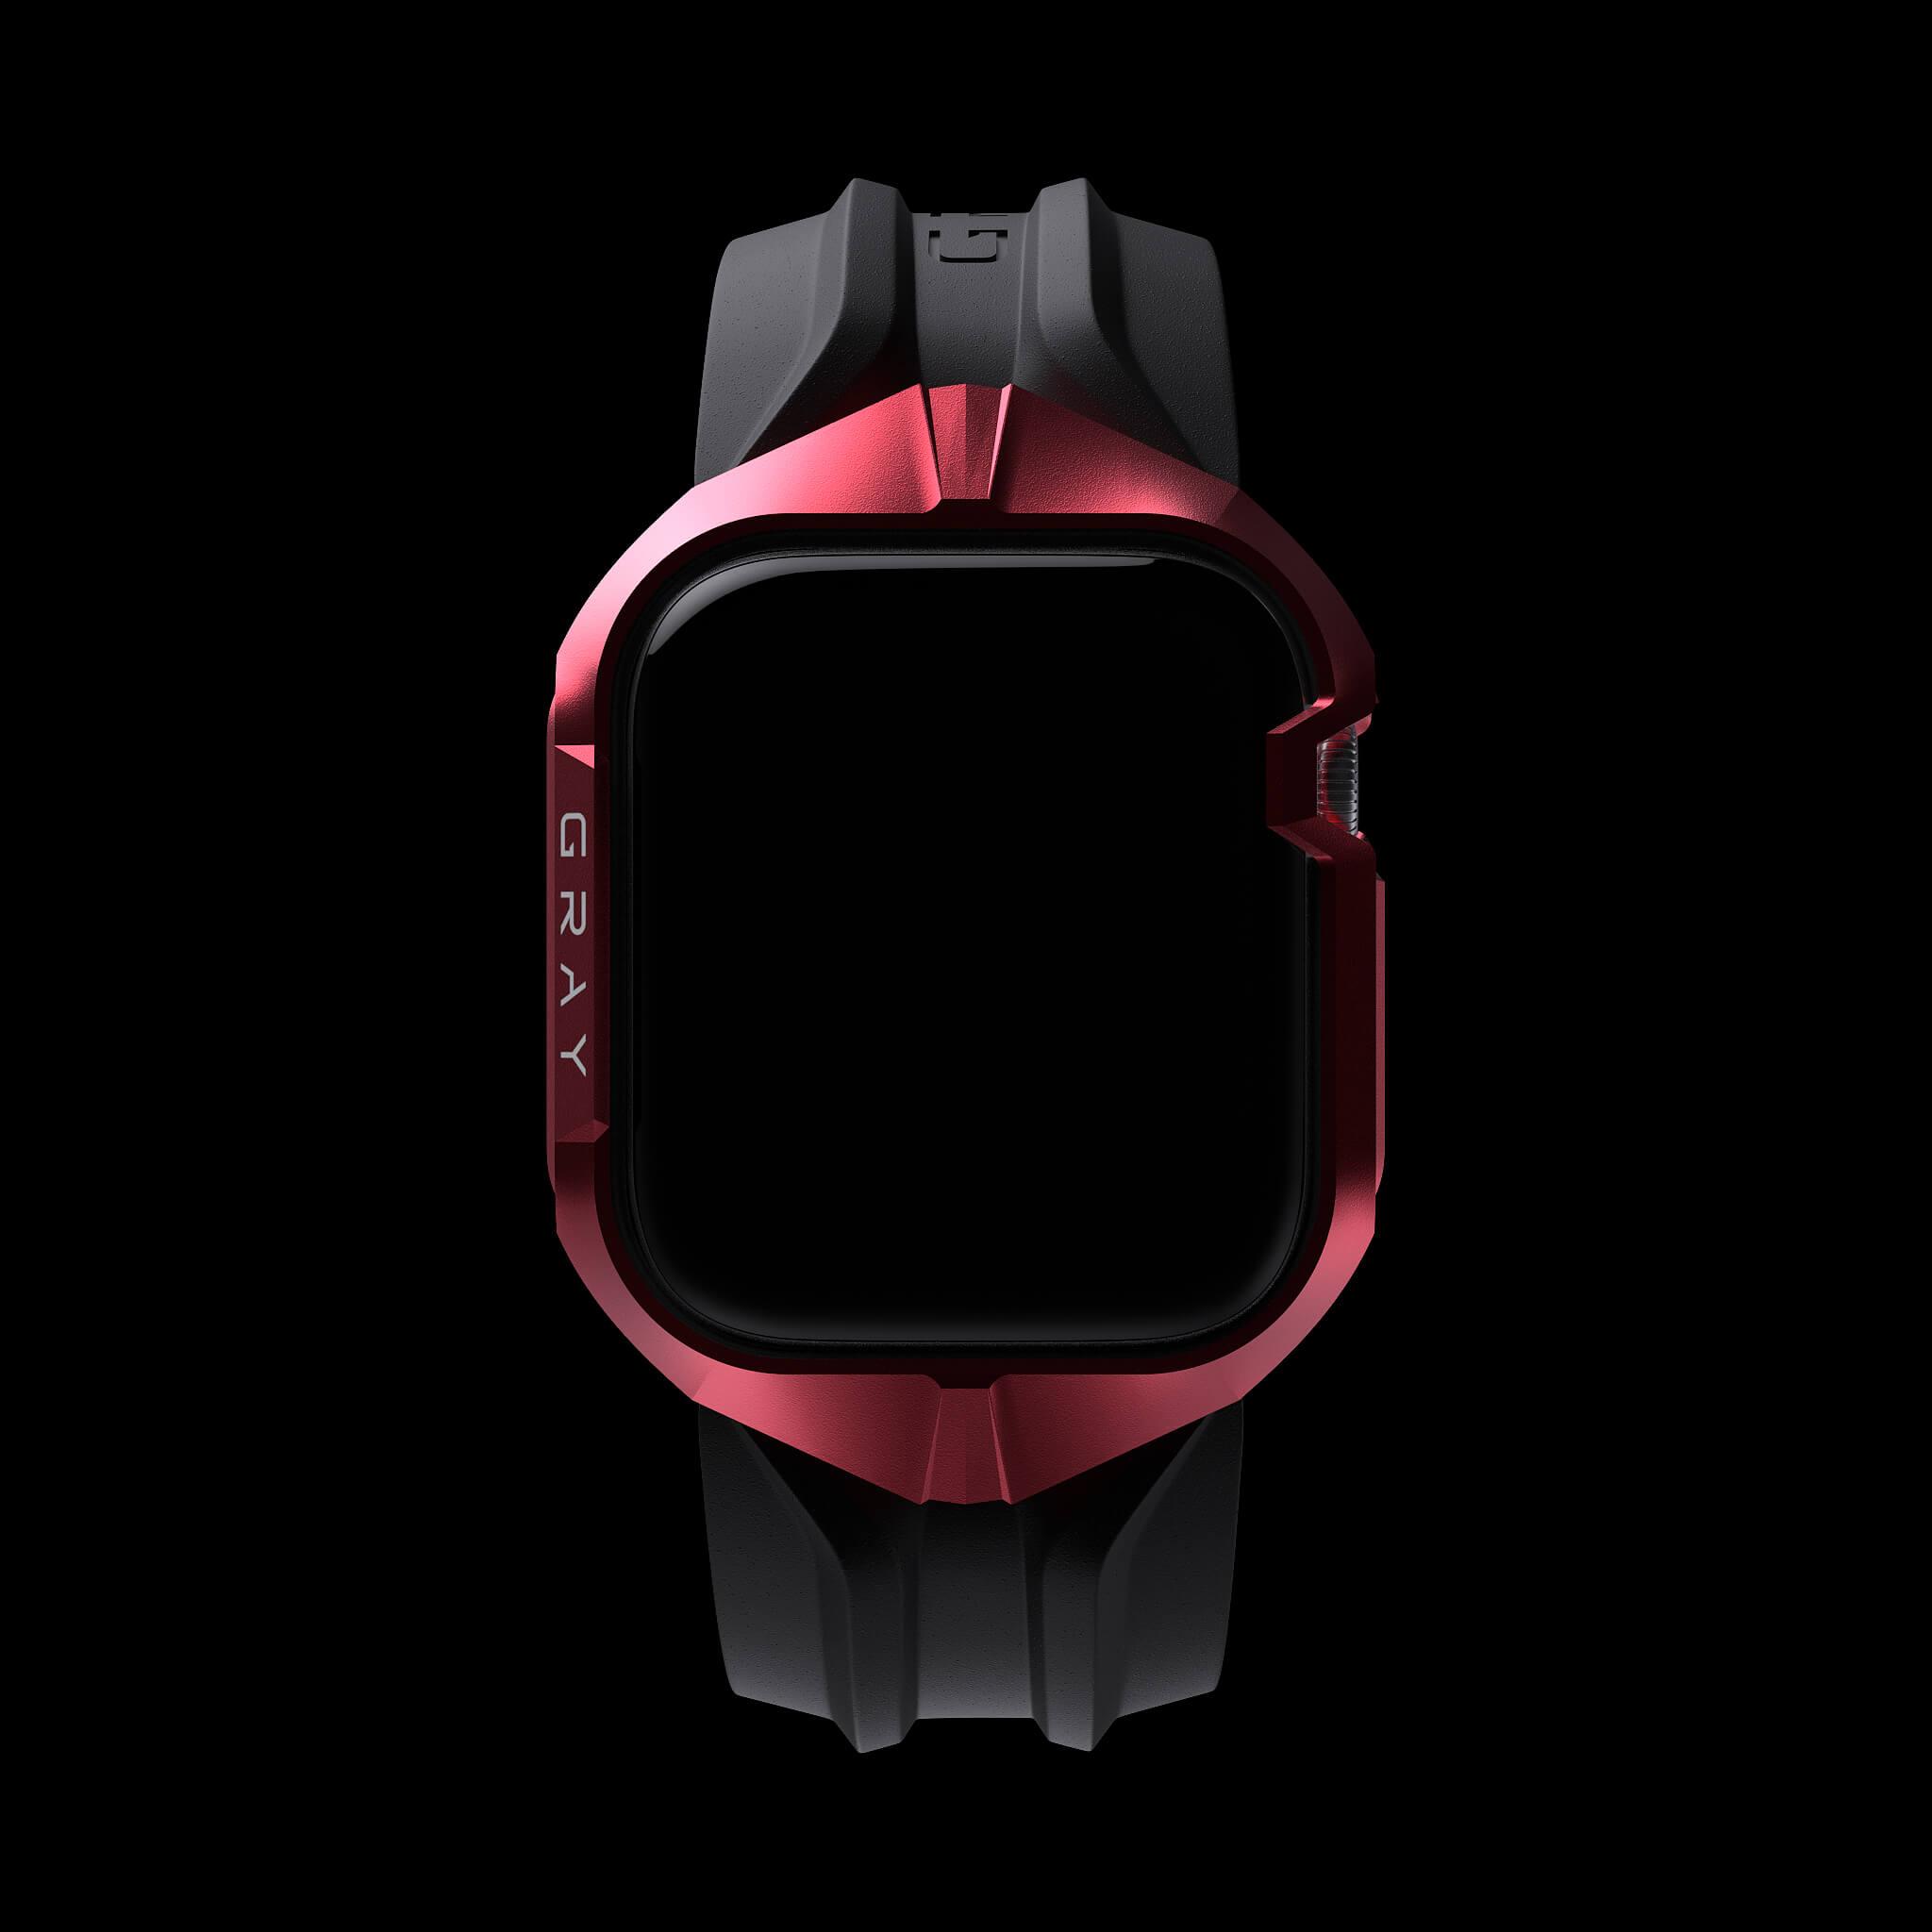 cyber watch pulsar red, luxury designer aluminium metal apple watch case